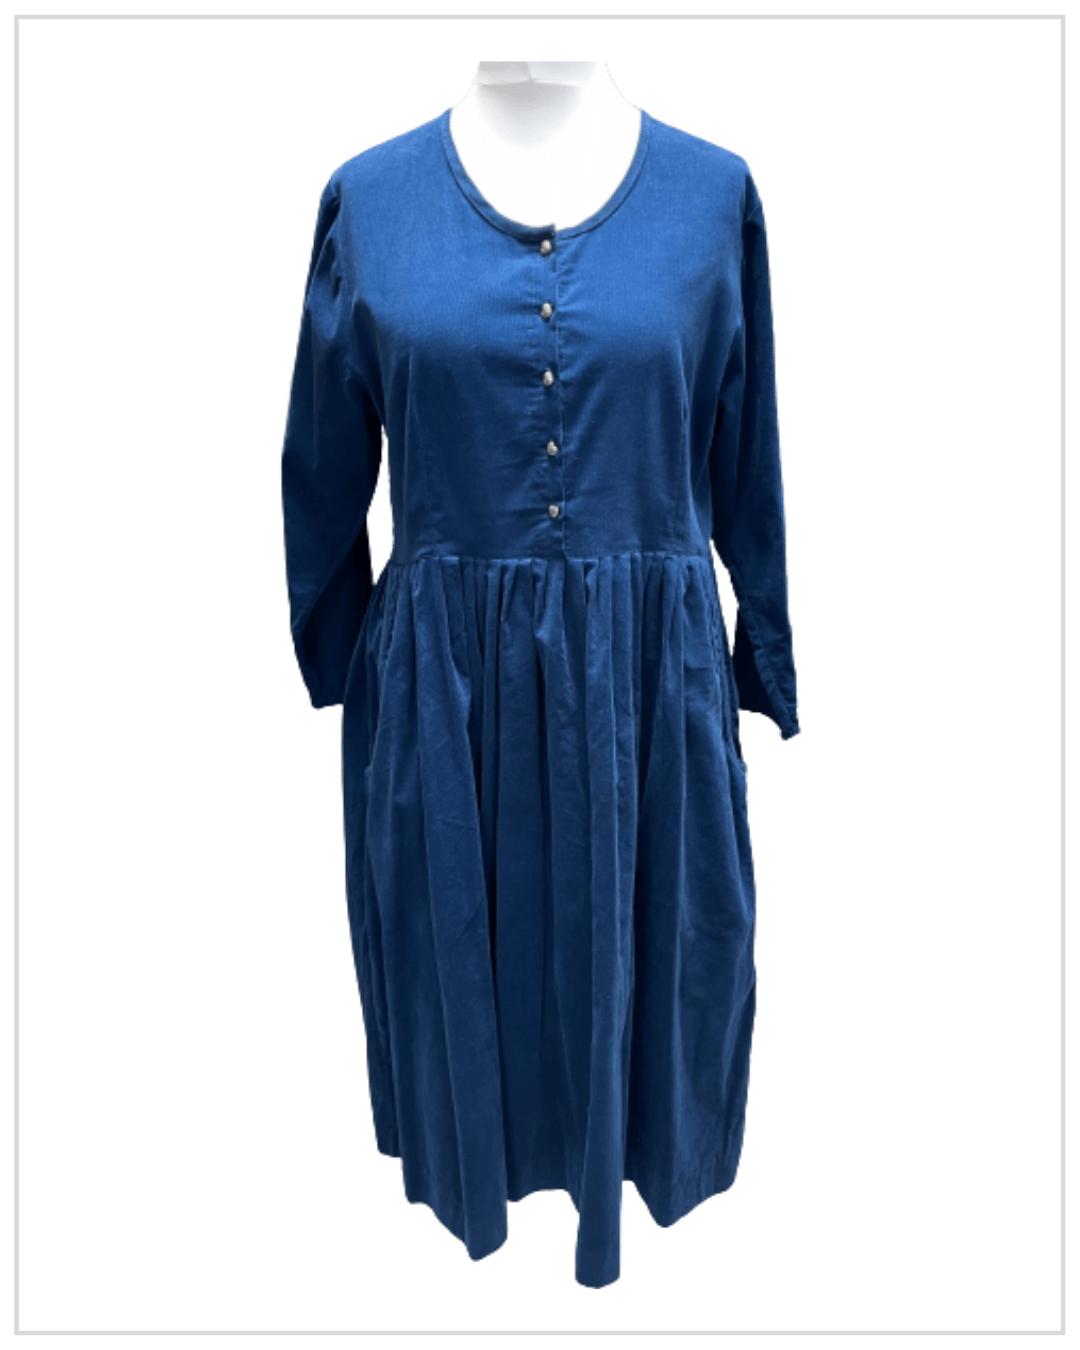 SHTAPEL velvetinė suknelė Natali 11716